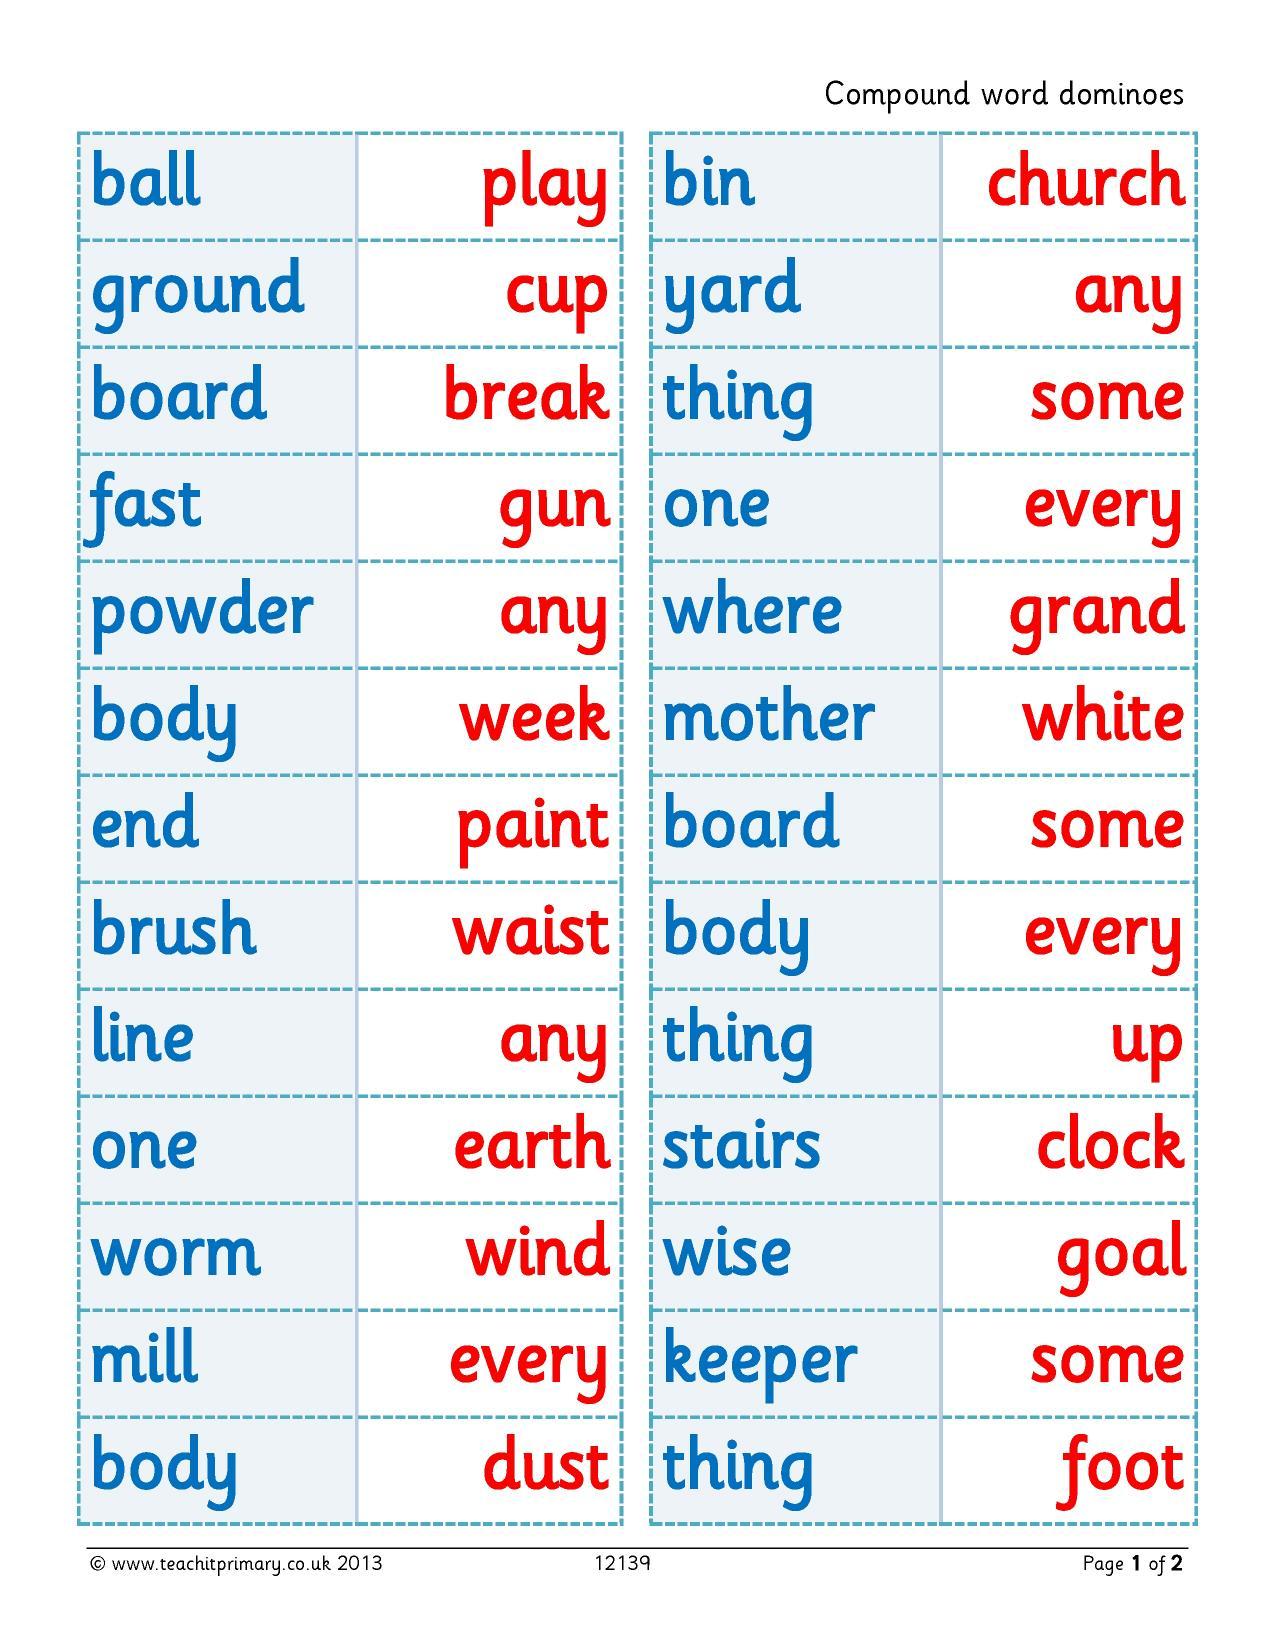 Word Classes